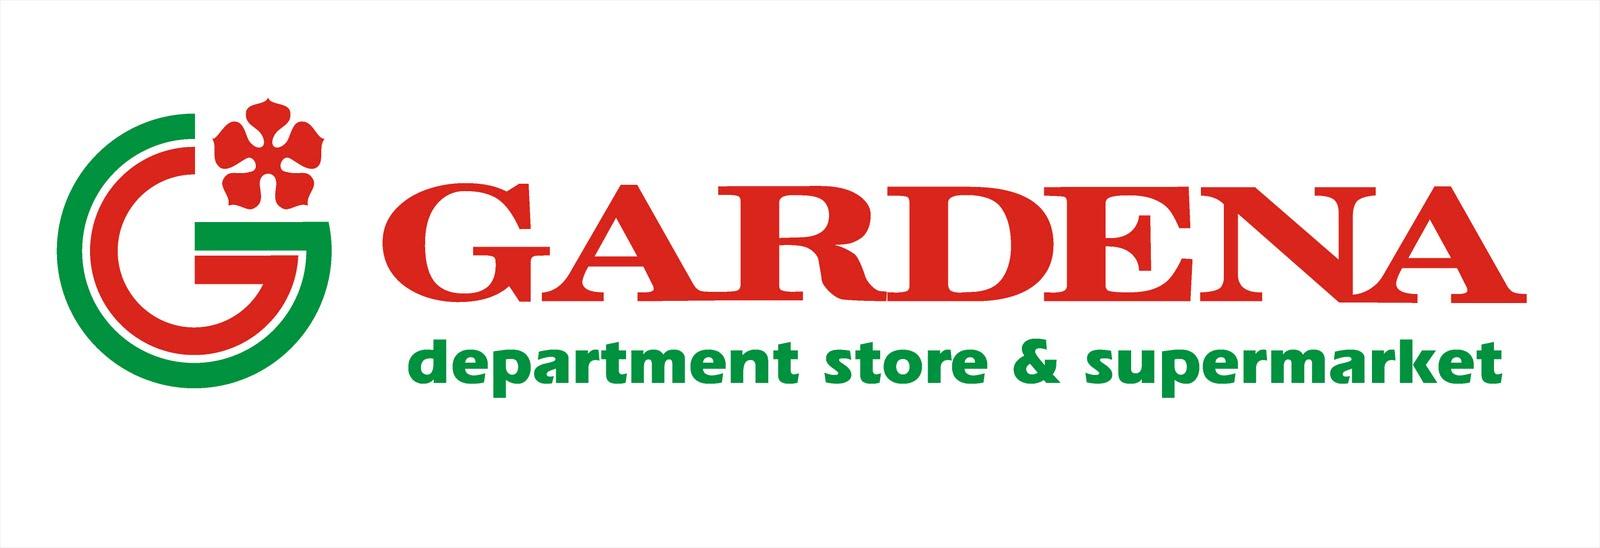 Lowongan Kerja Terbaru di Gardena - Yogyakarta